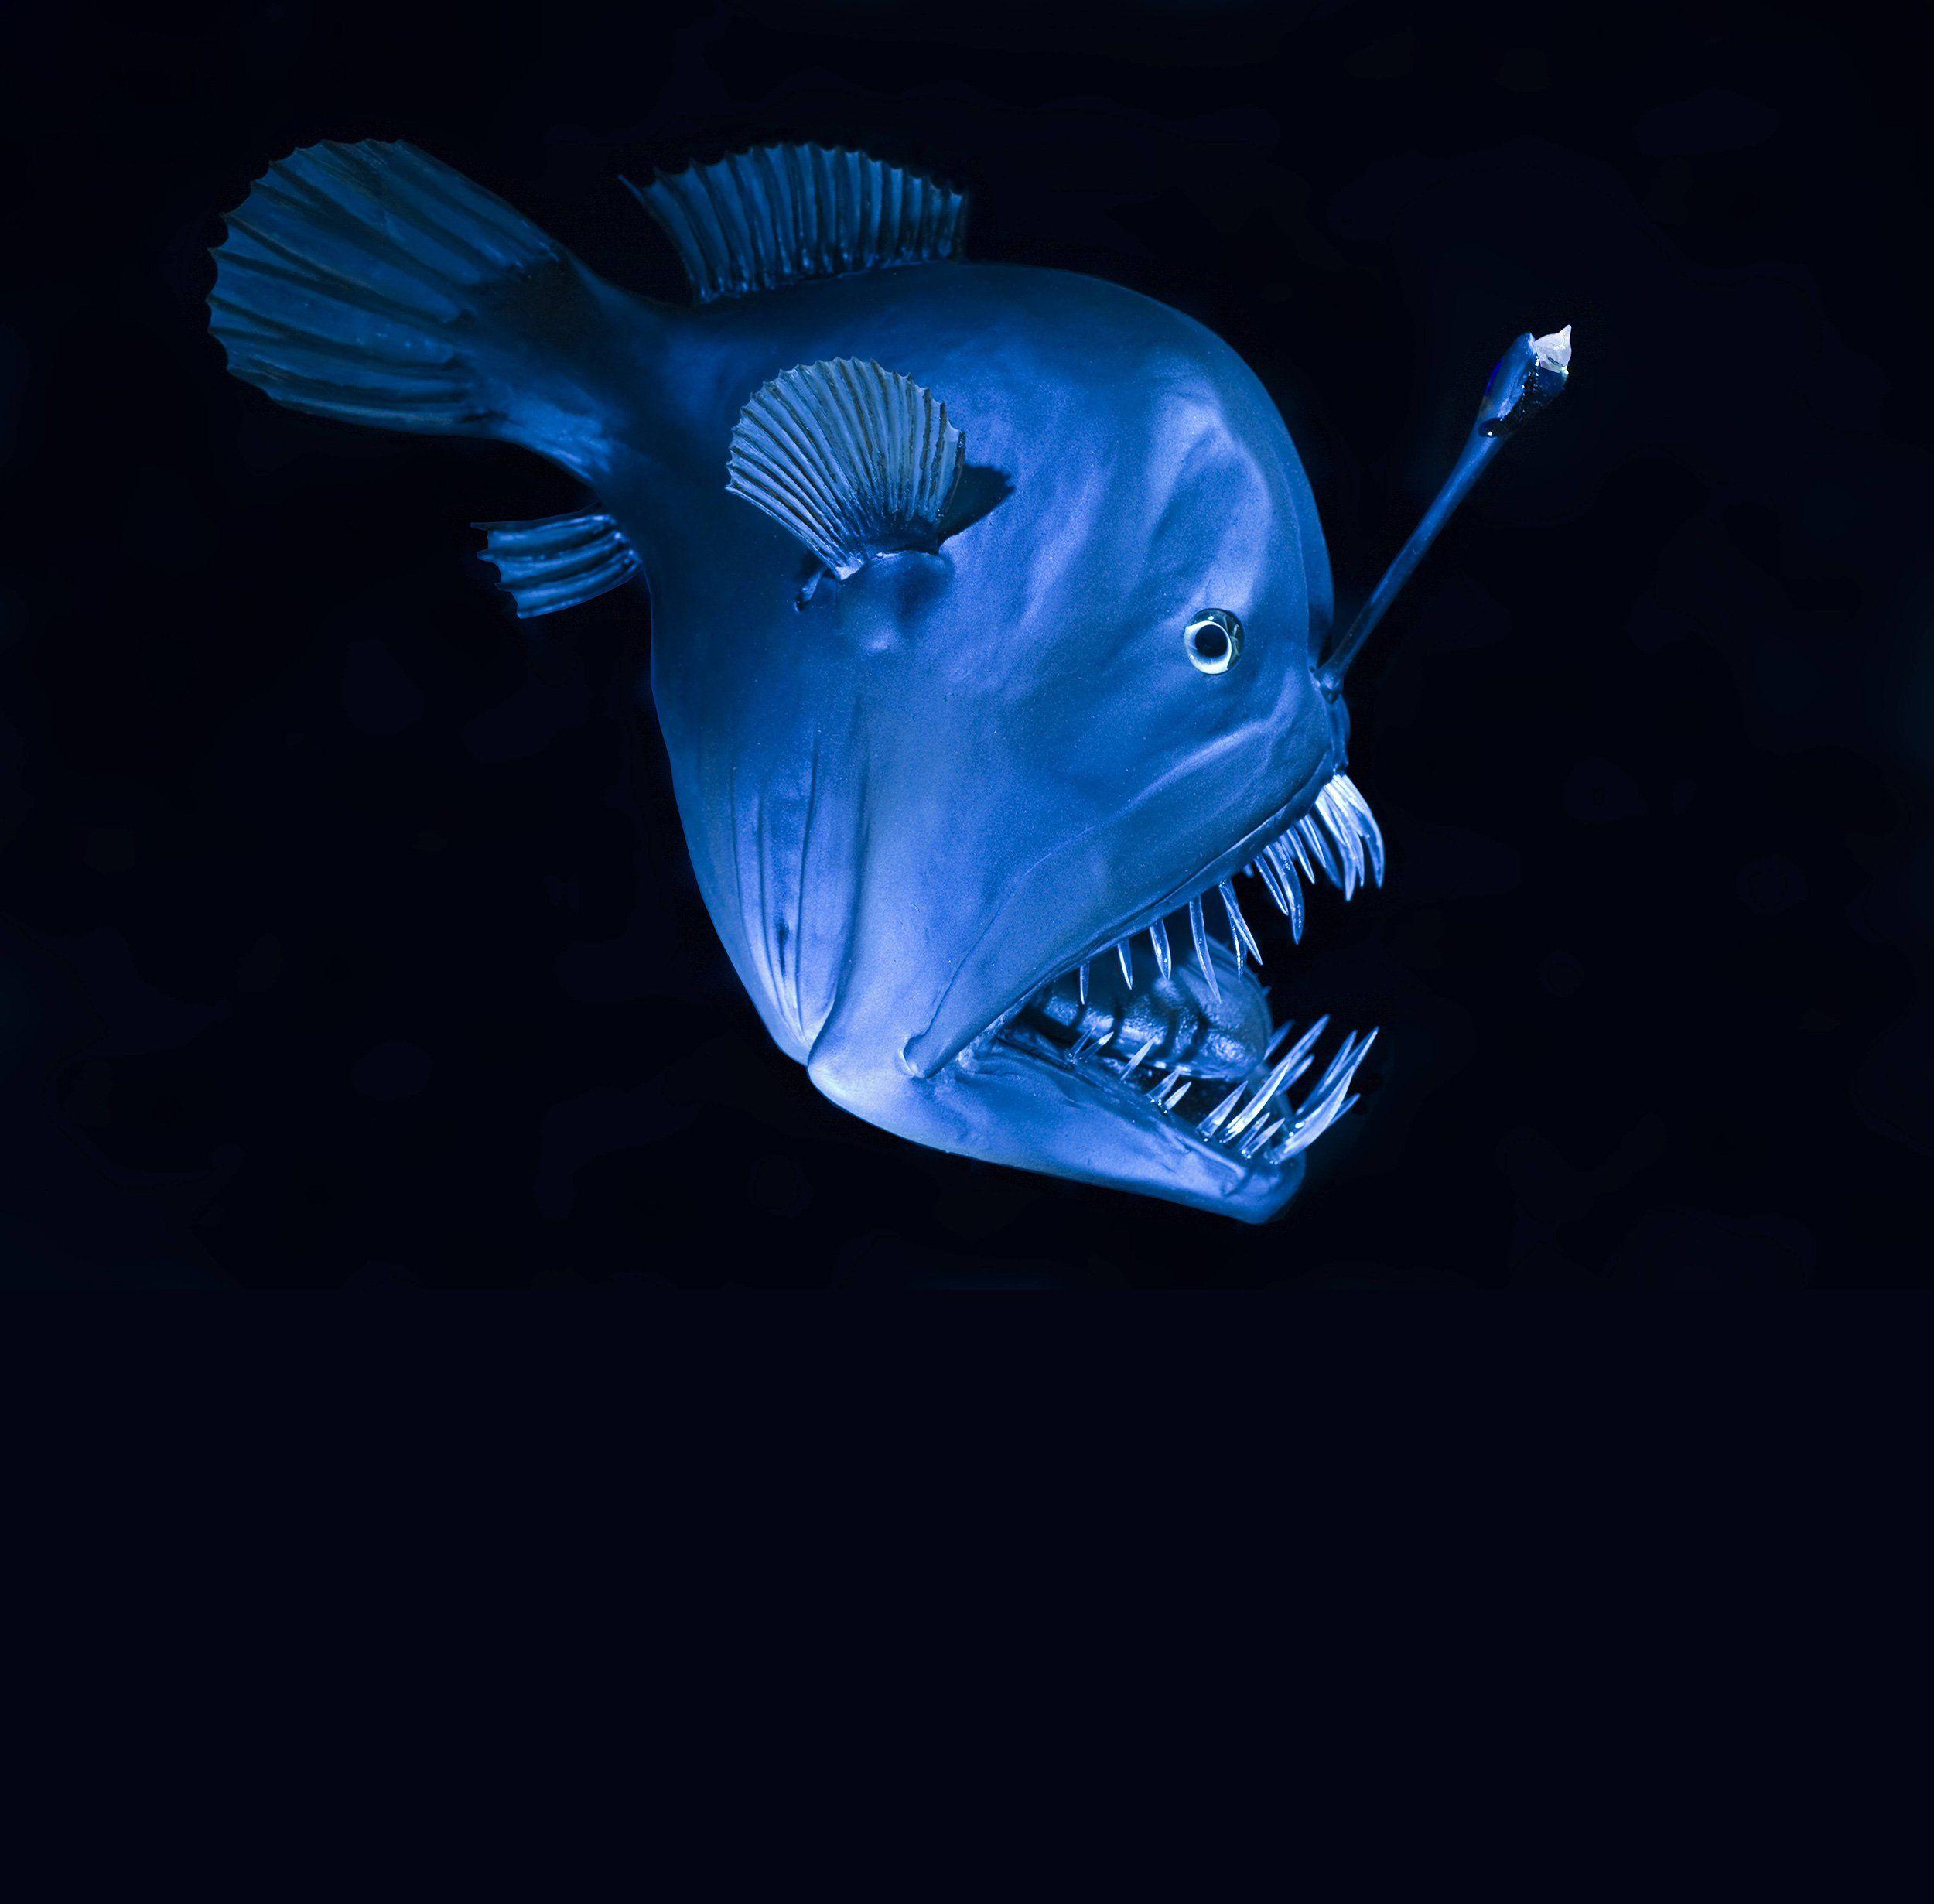 Monsterfisch